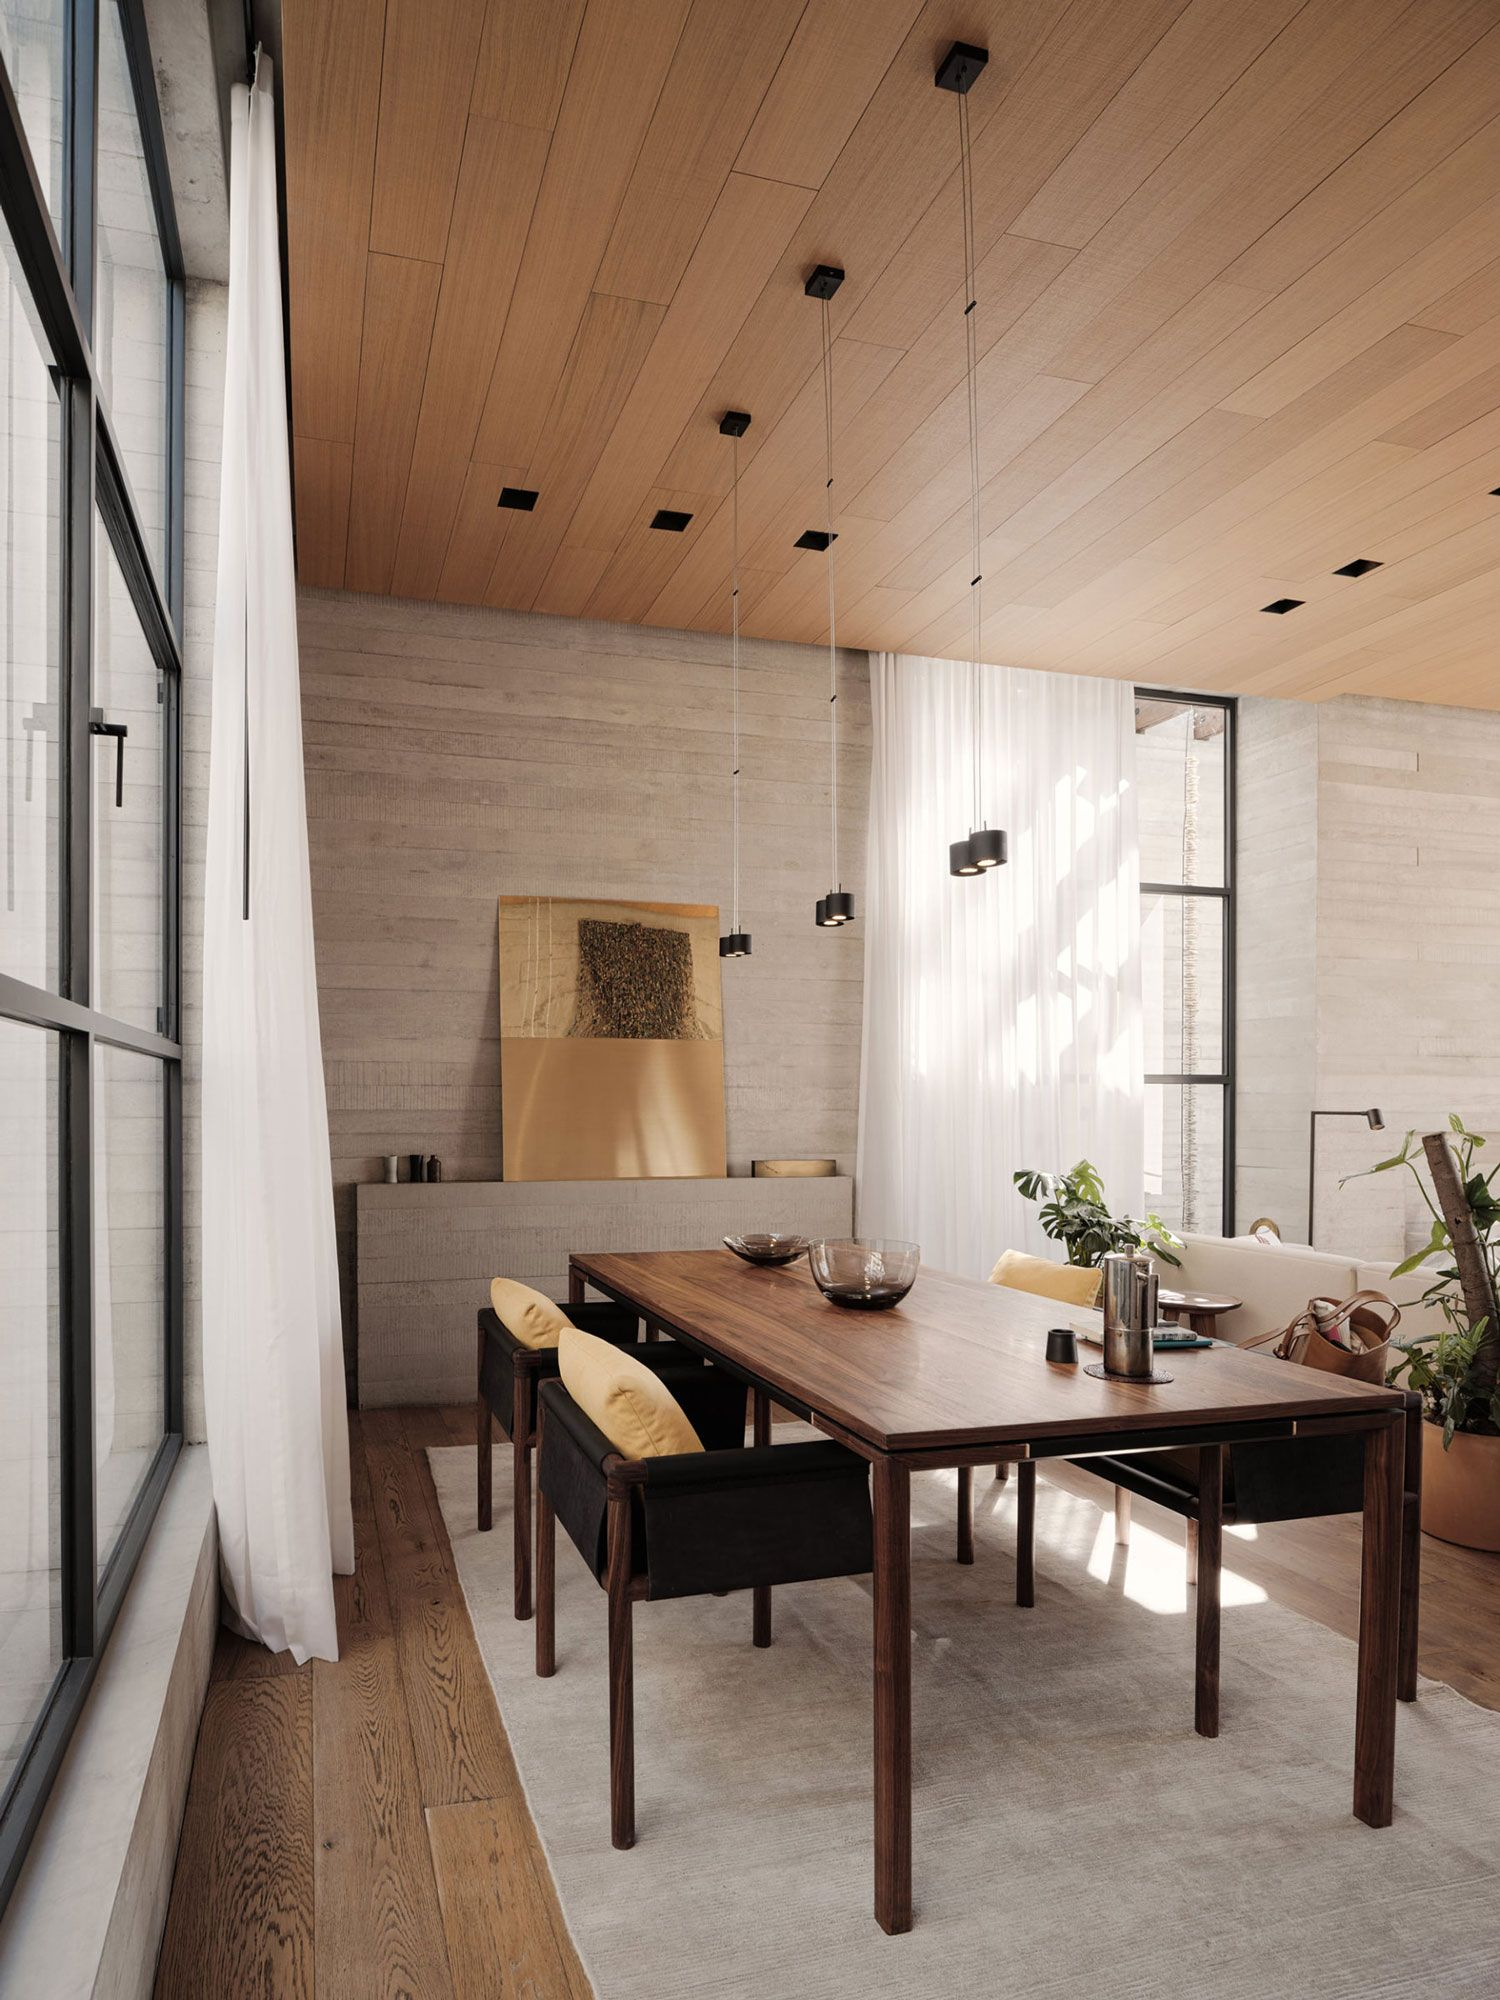 Tennyson 205 Apartment Building in Mexico City by Studio ...